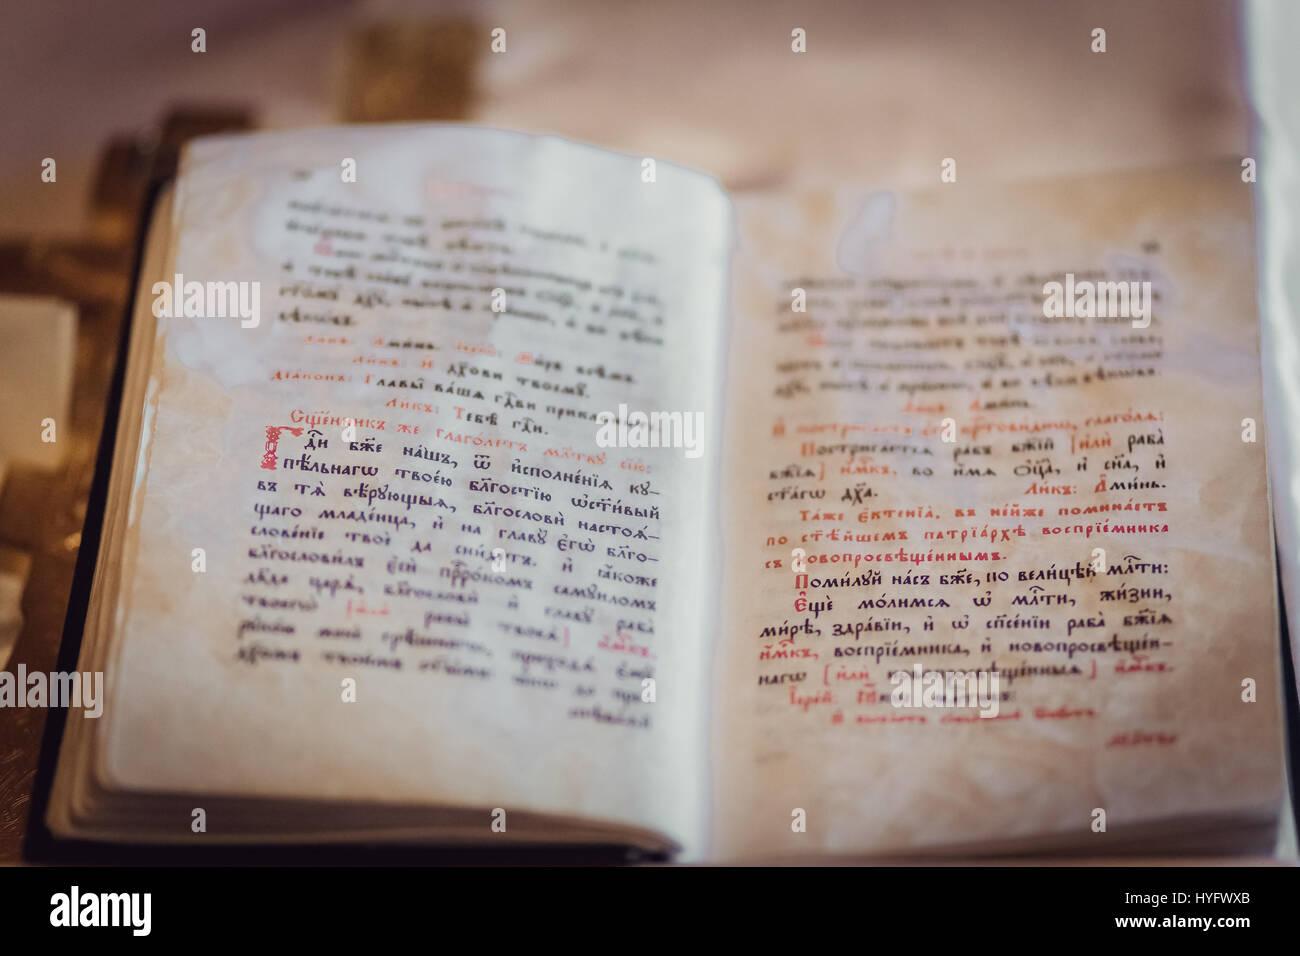 Orthodox book in Slavonic language - Stock Image